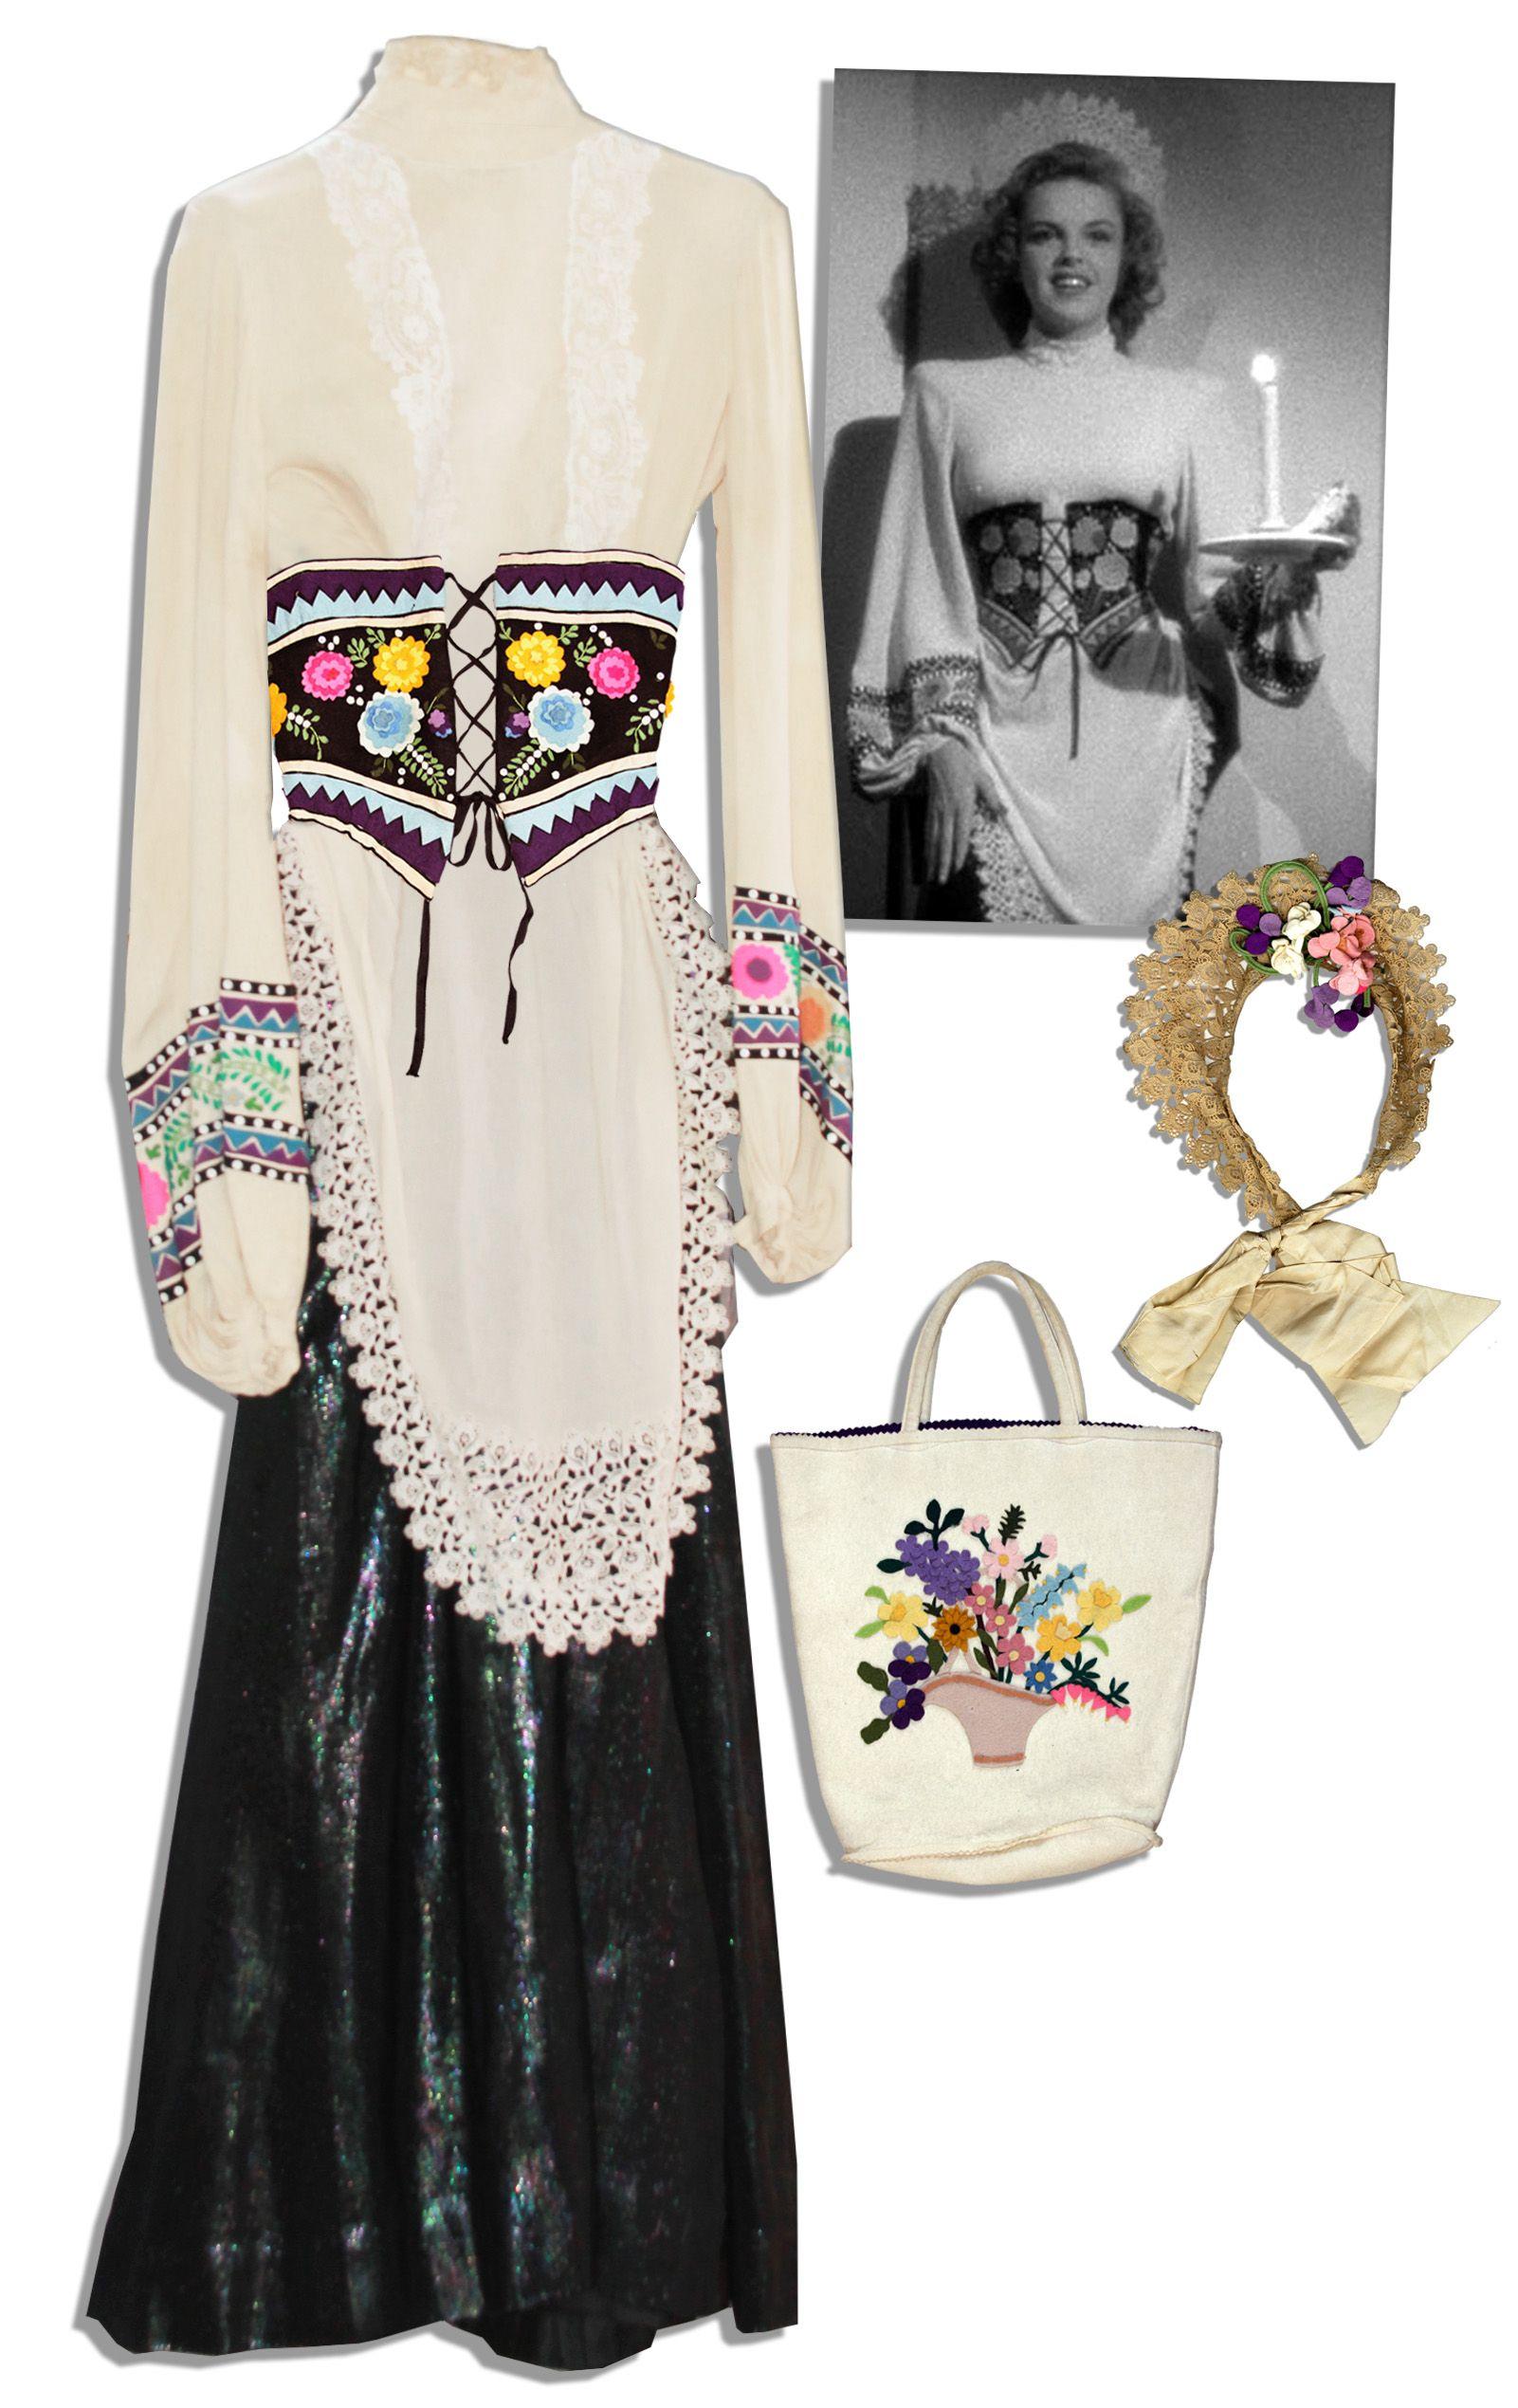 Judy Garland Memorabilia